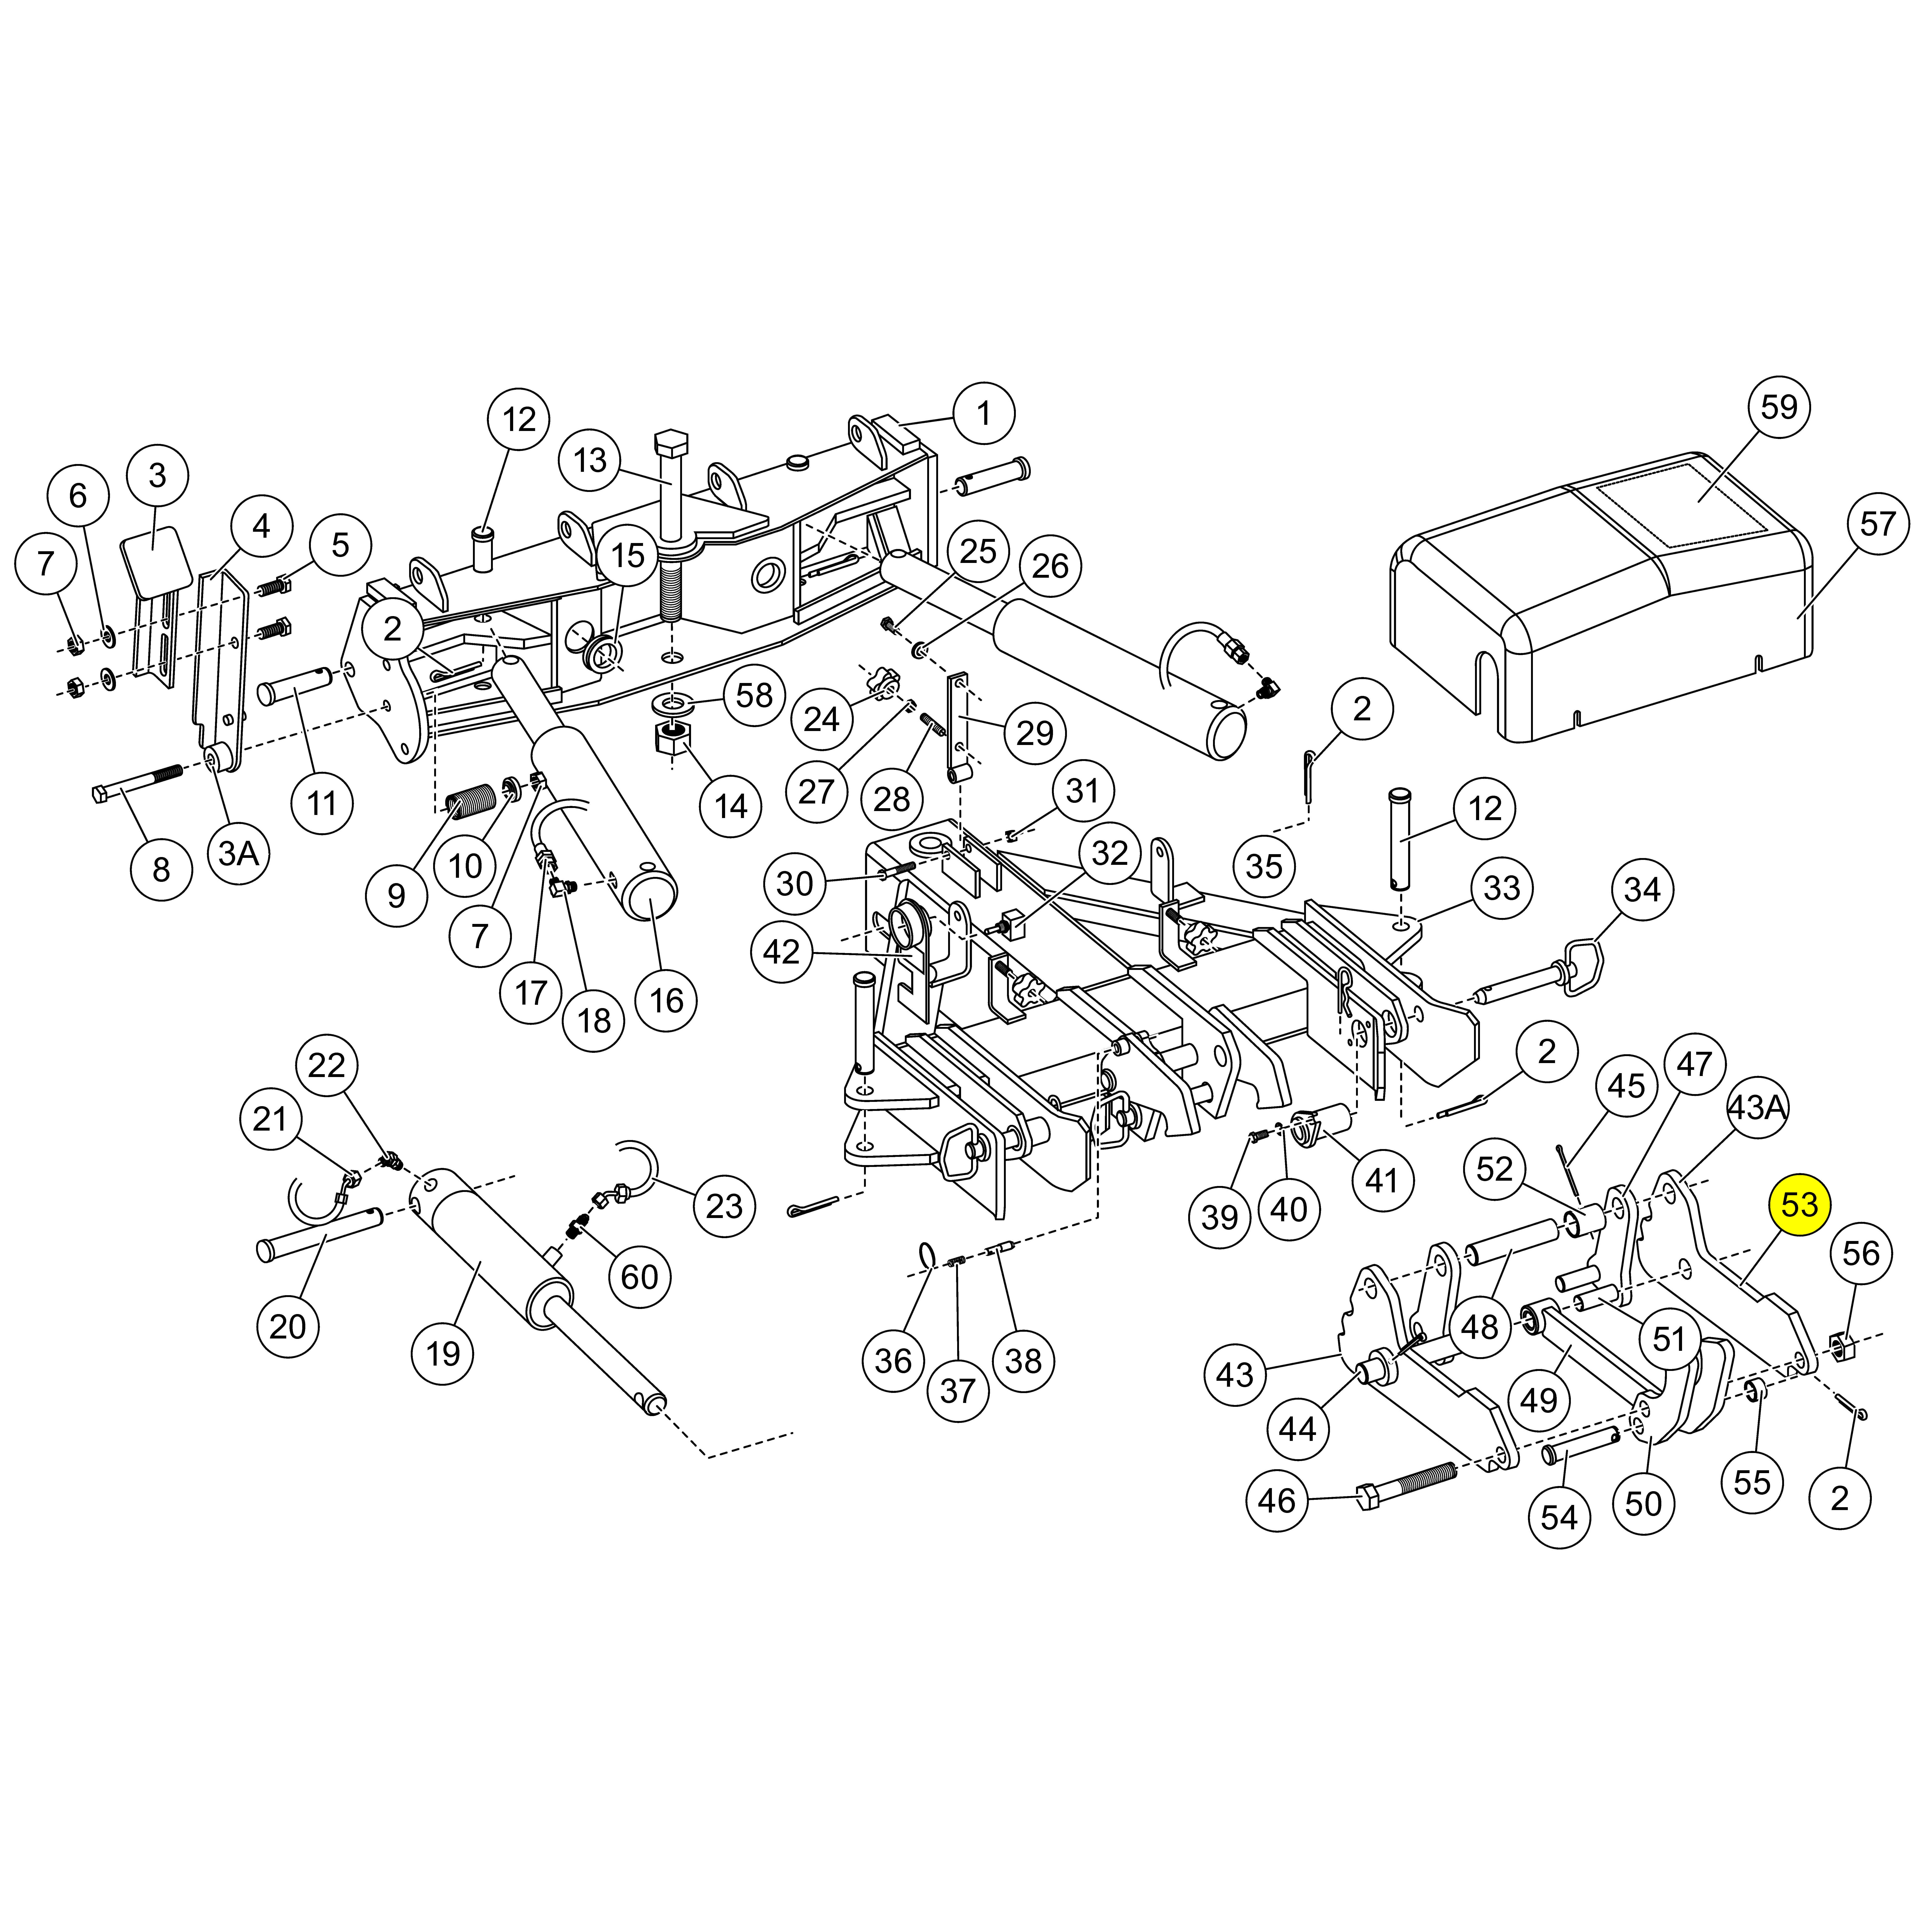 Blizzard Power Plow Motor Diagram Wiring Data Hitch Snow B40081 50 Offliqui 37 61 Call 219 Rh Vhs Hydraulics Etc Com Plows Schematic